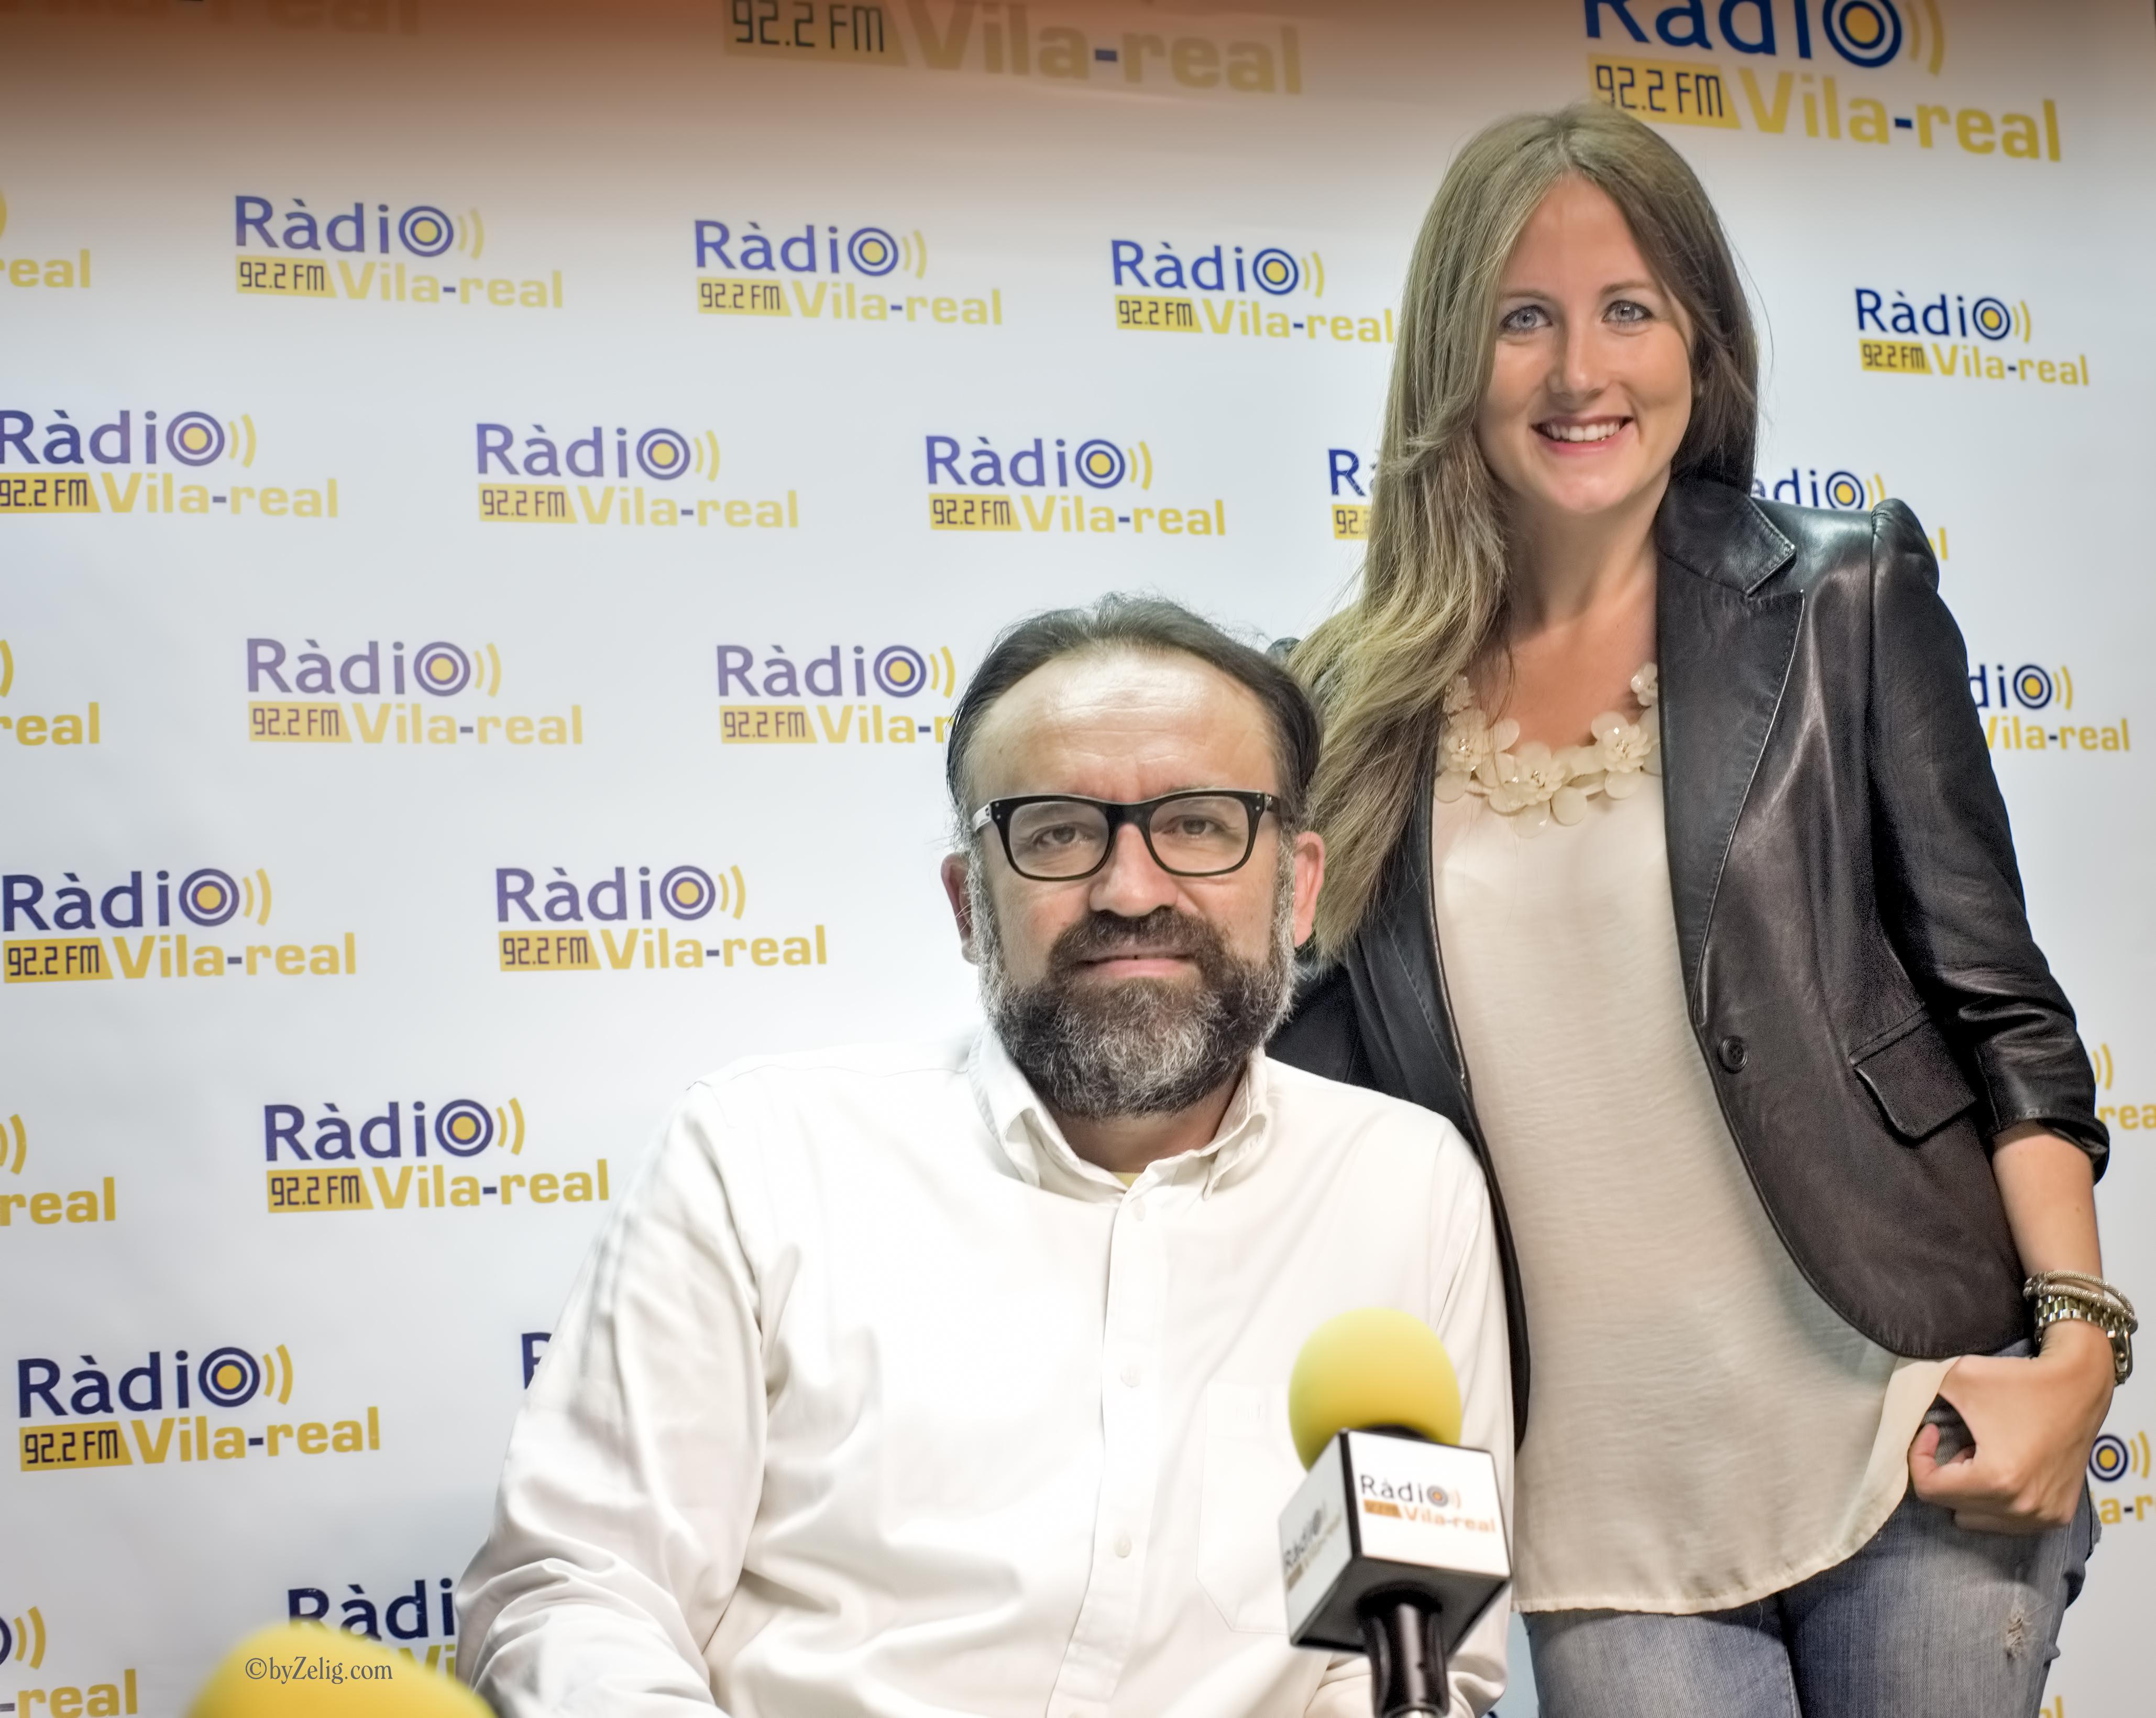 Esports Radio Vila-real. Programa del 1 de diciembre 2017